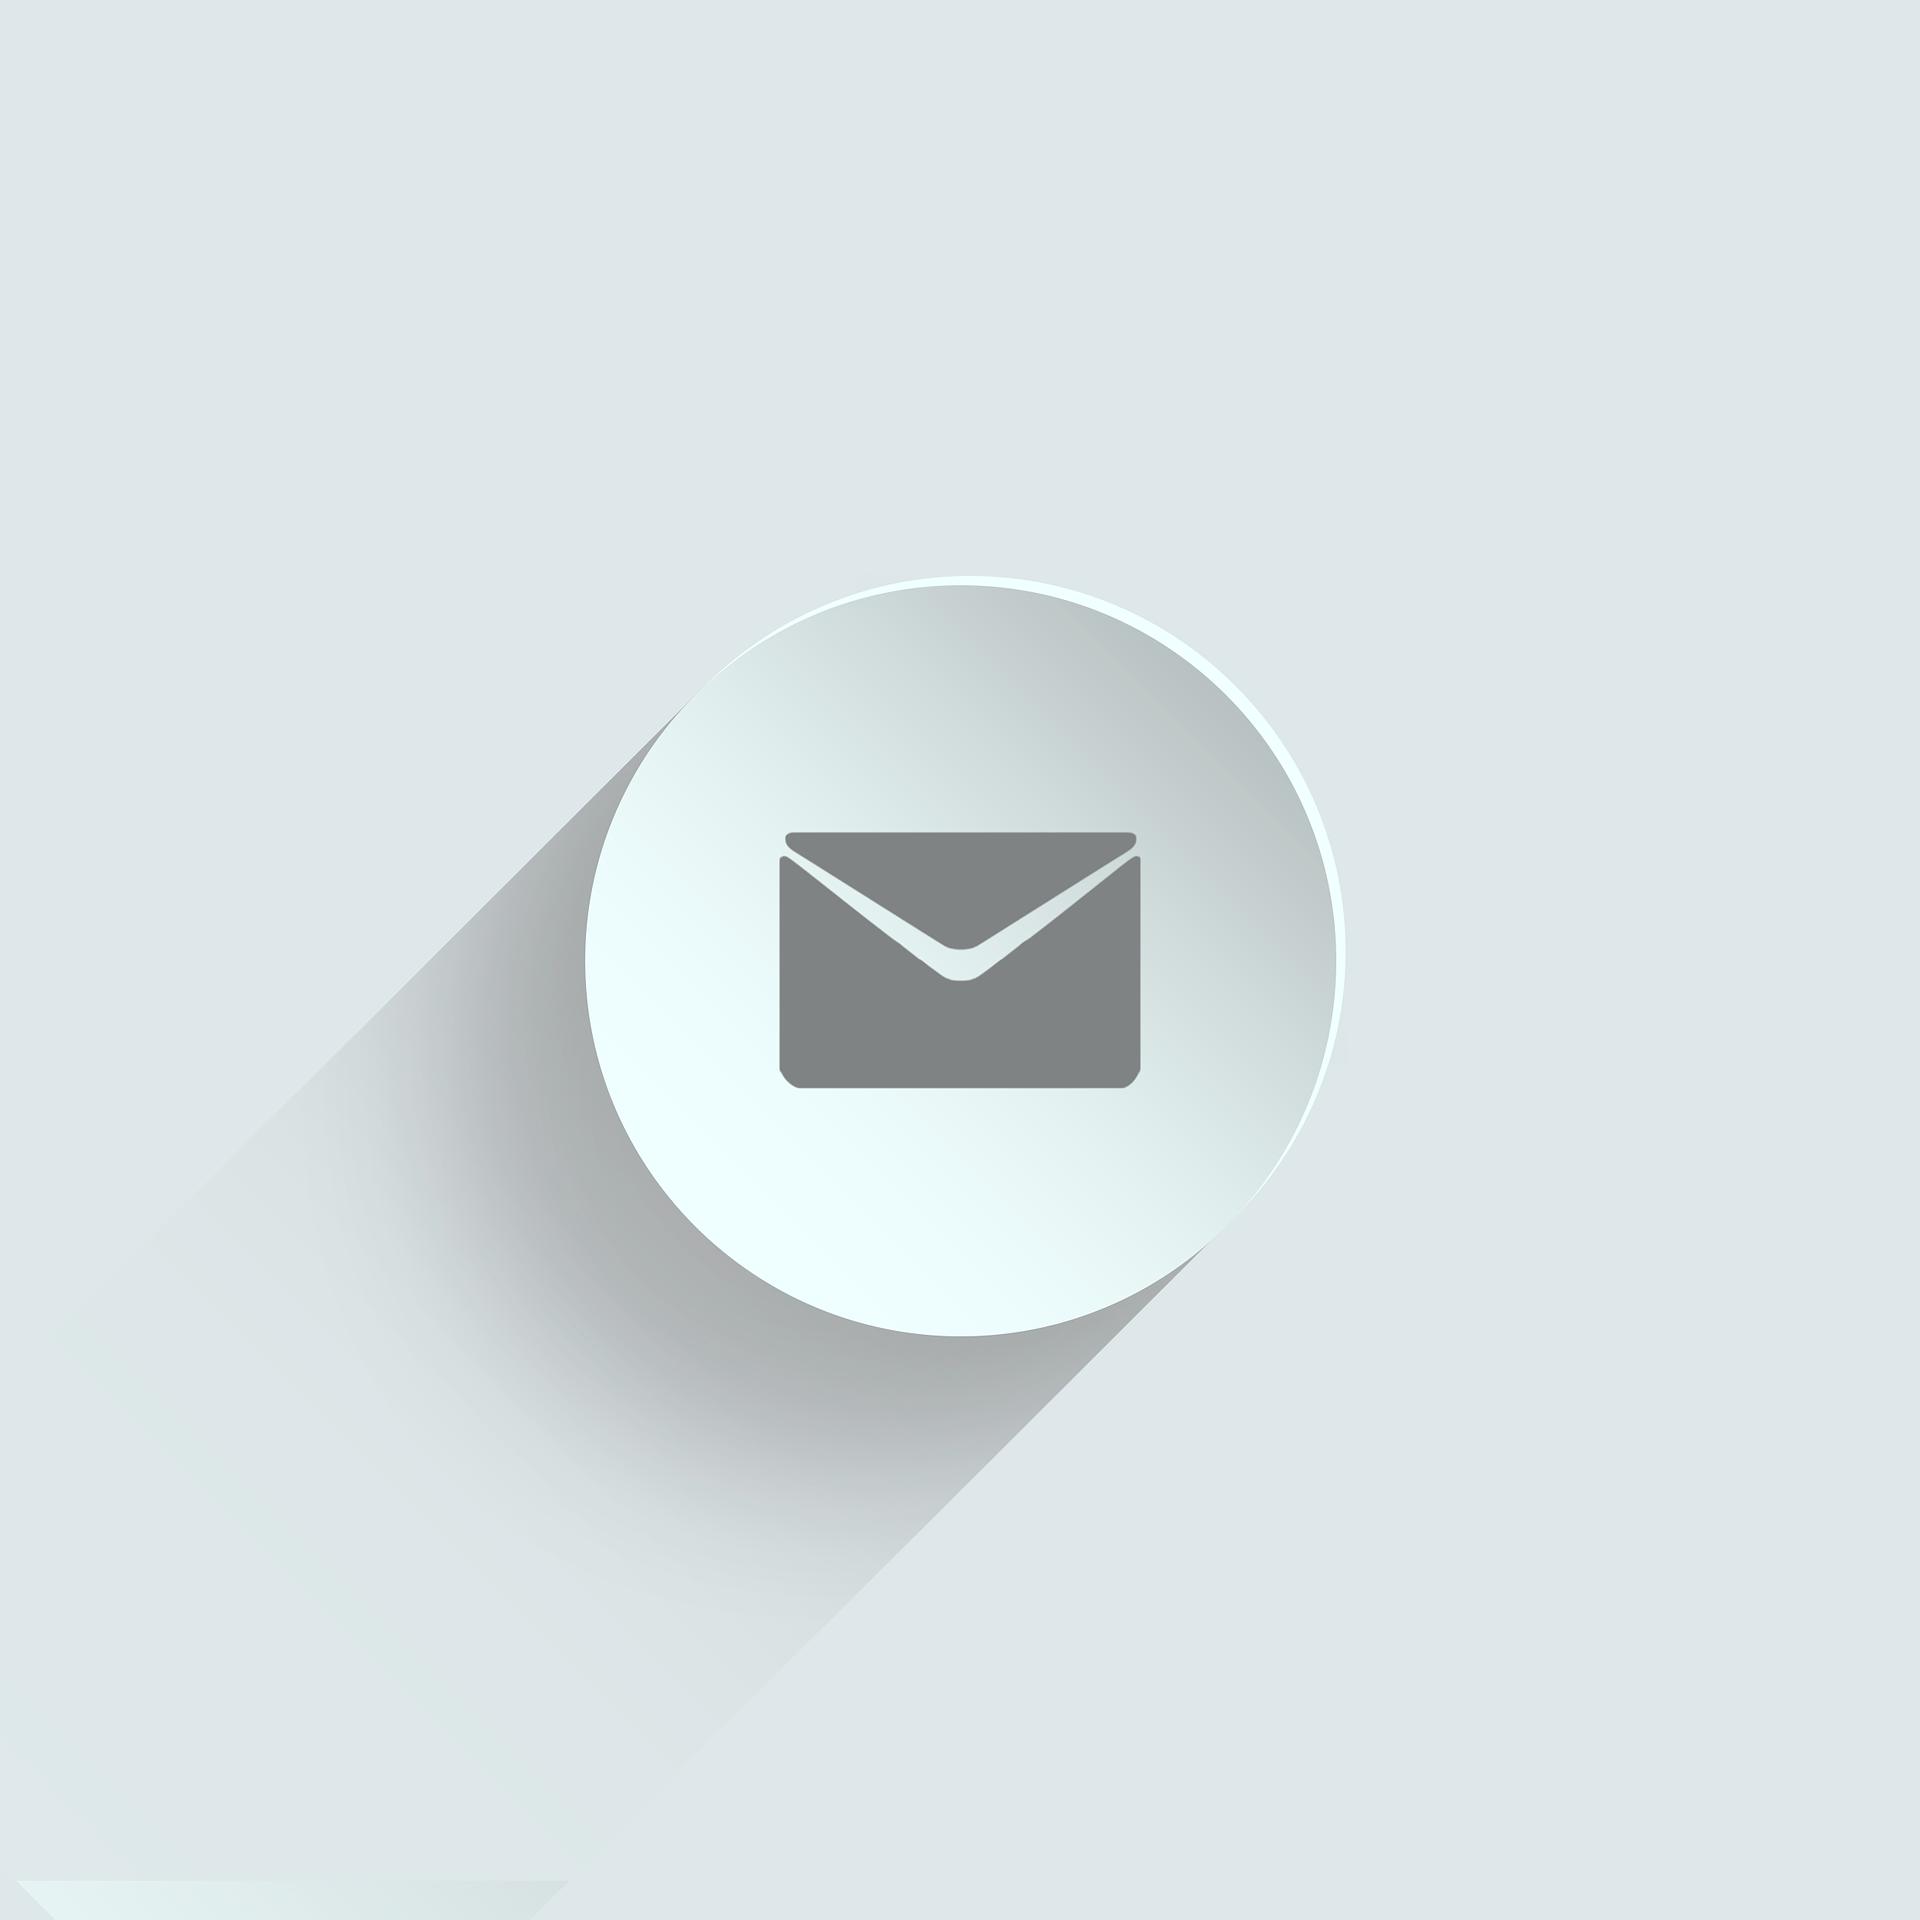 icono correo electronico